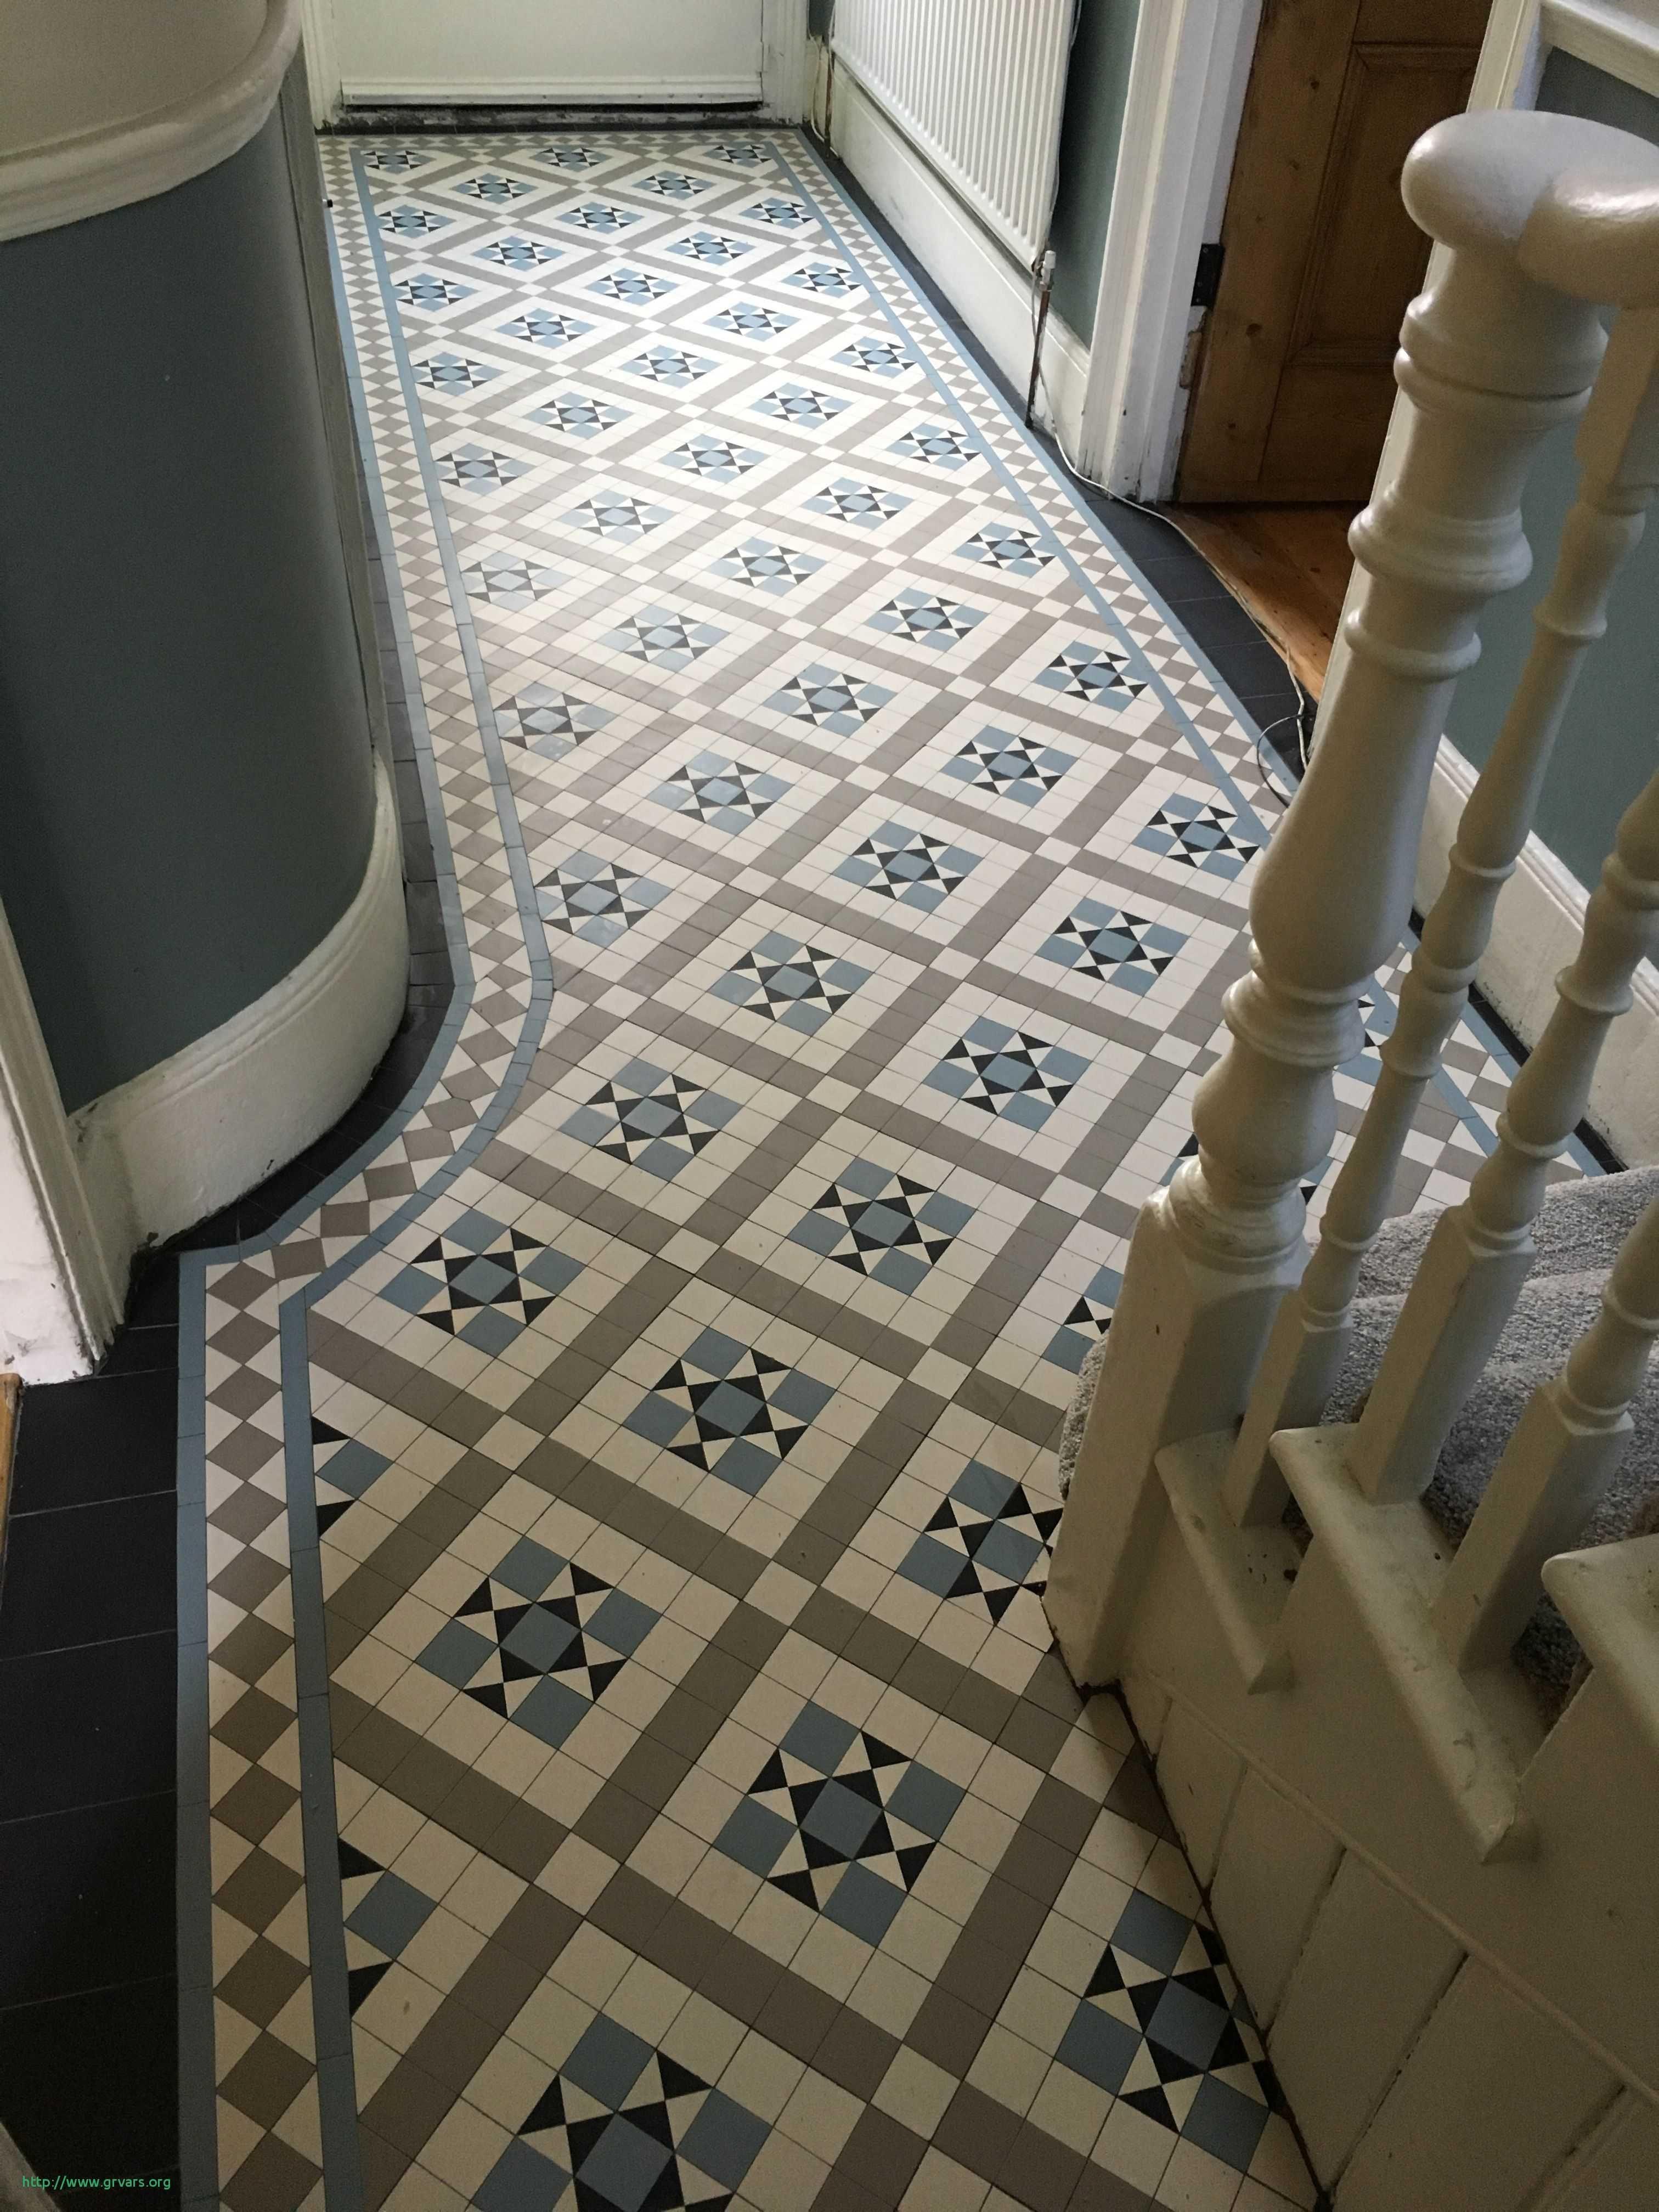 1930s Floor Tiles Reproduction Inspirant Pin By D D Dµn N On Dÿd D N Dºd Pinterest Ideas Blog Tiled Hallway Hallway Flooring Victorian Hallway